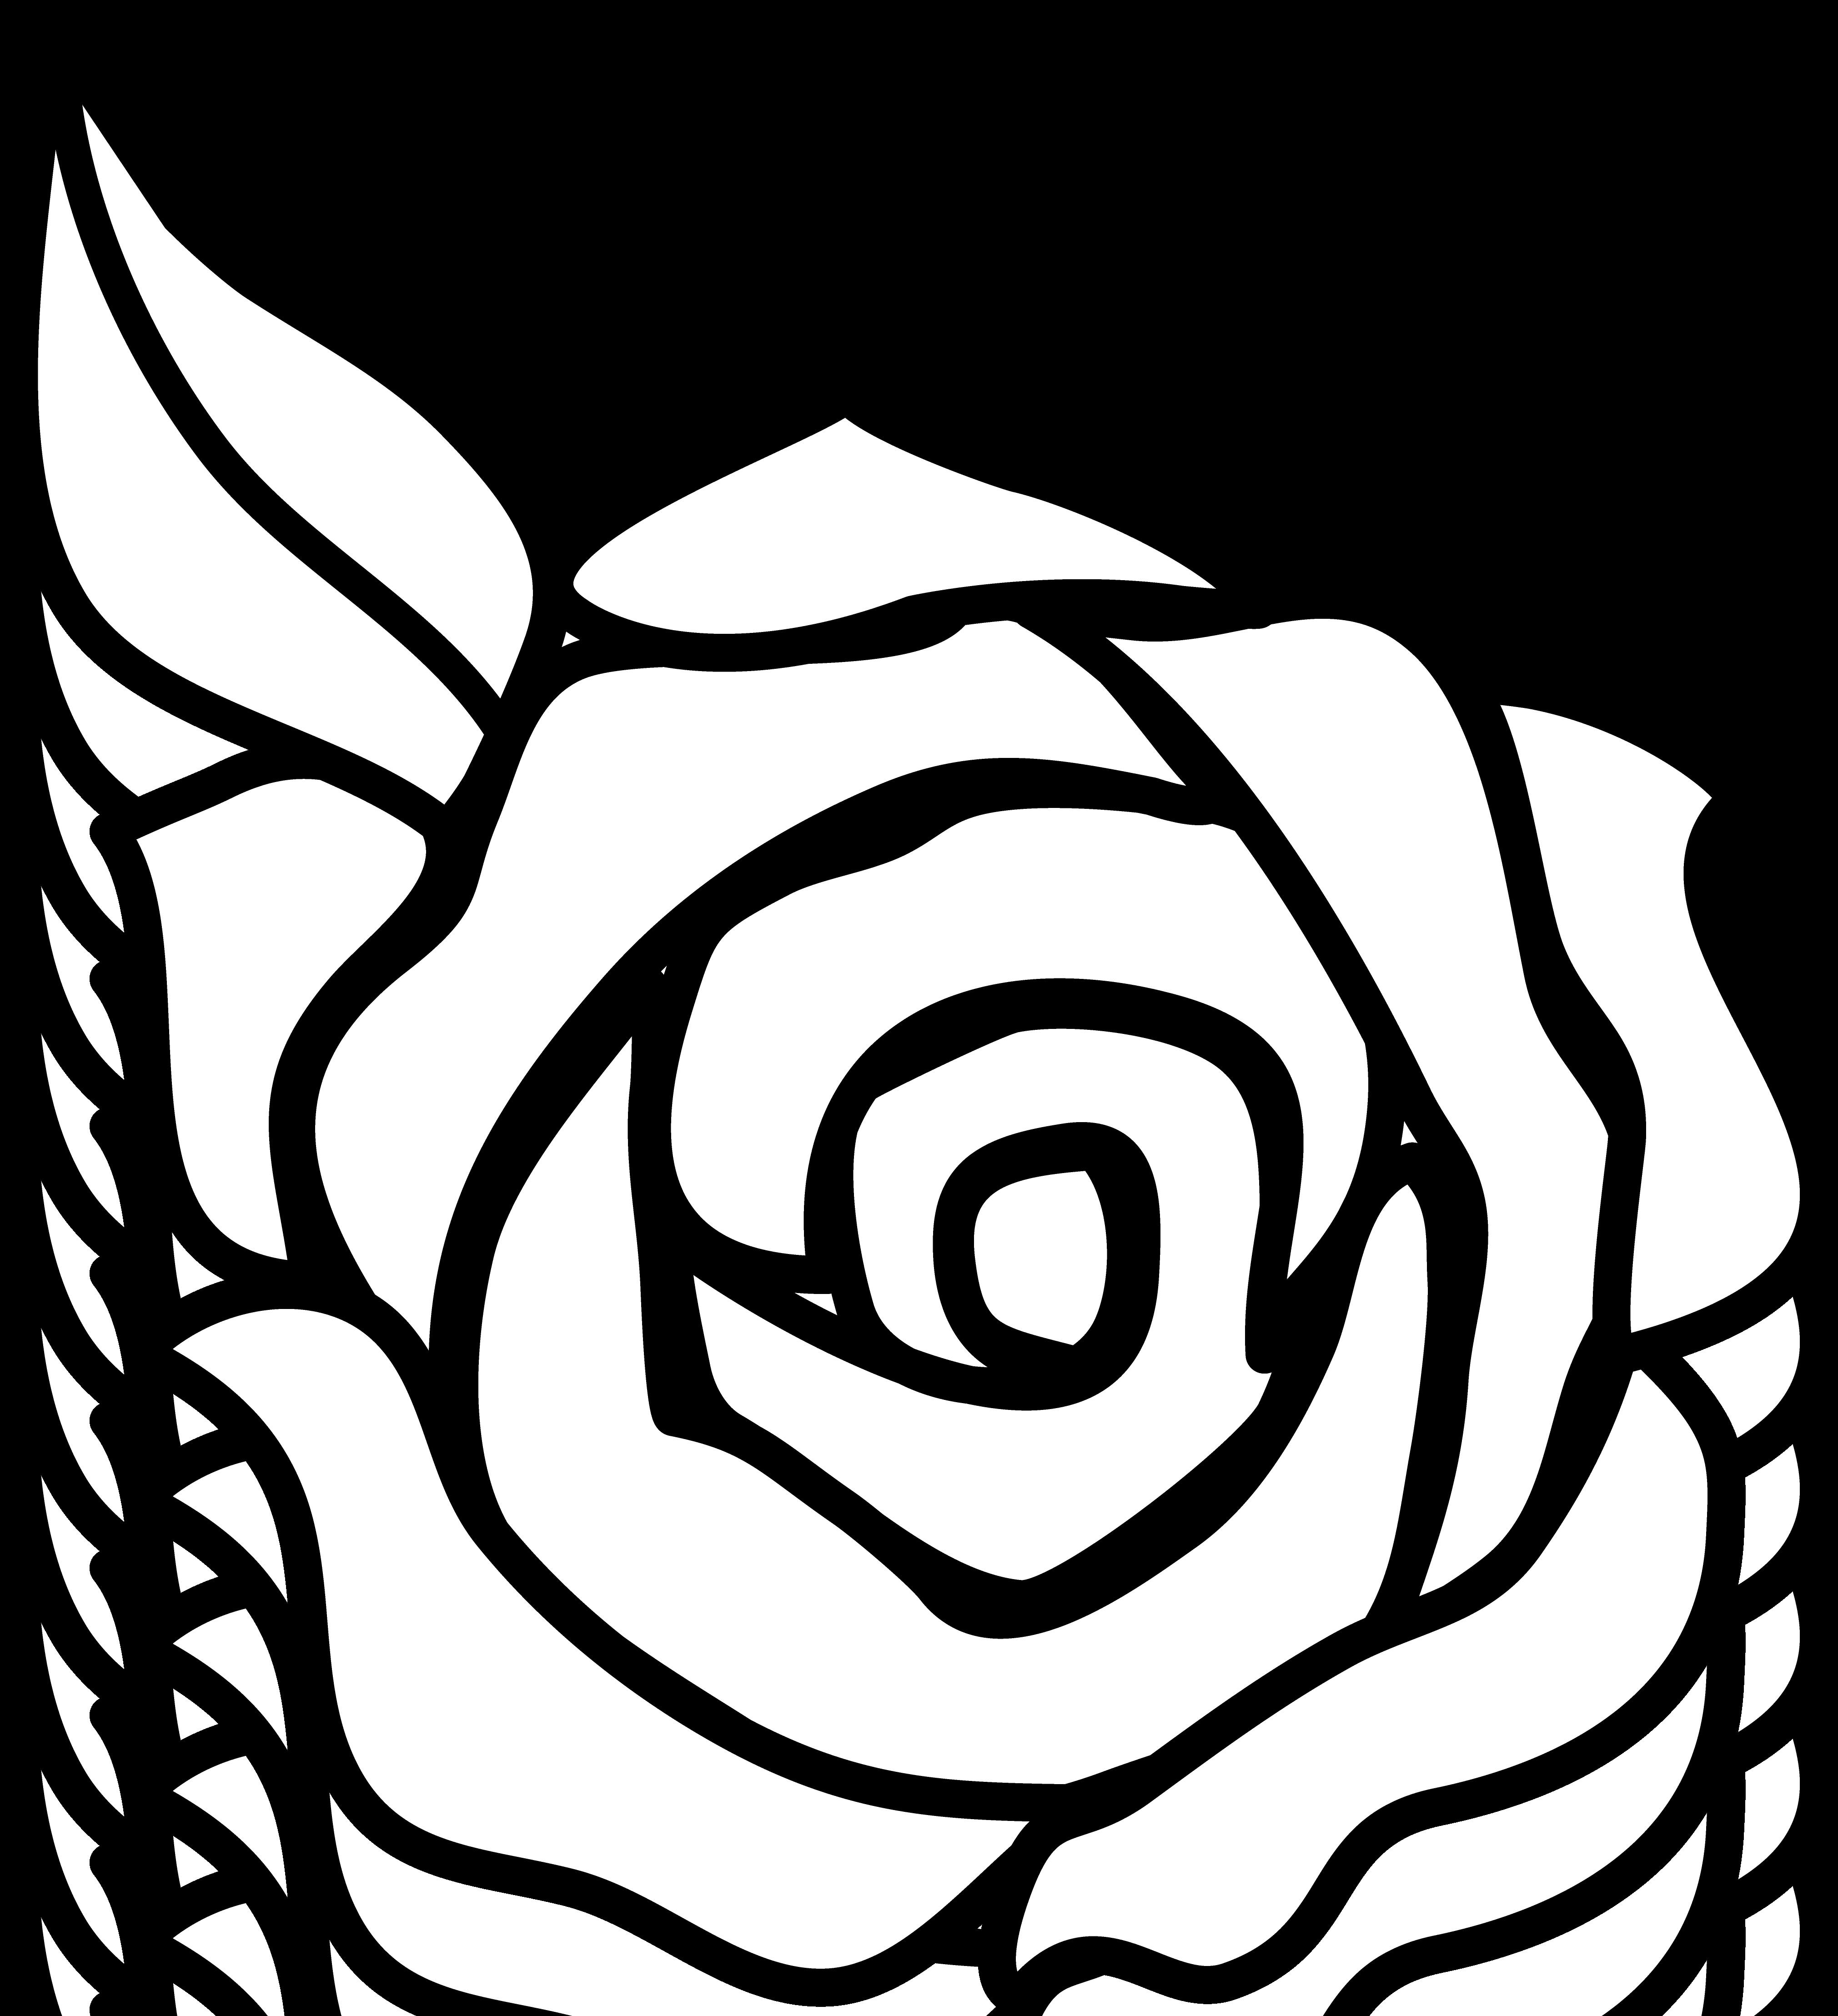 Black Rose Drawing - Delazious  - Clipart Best